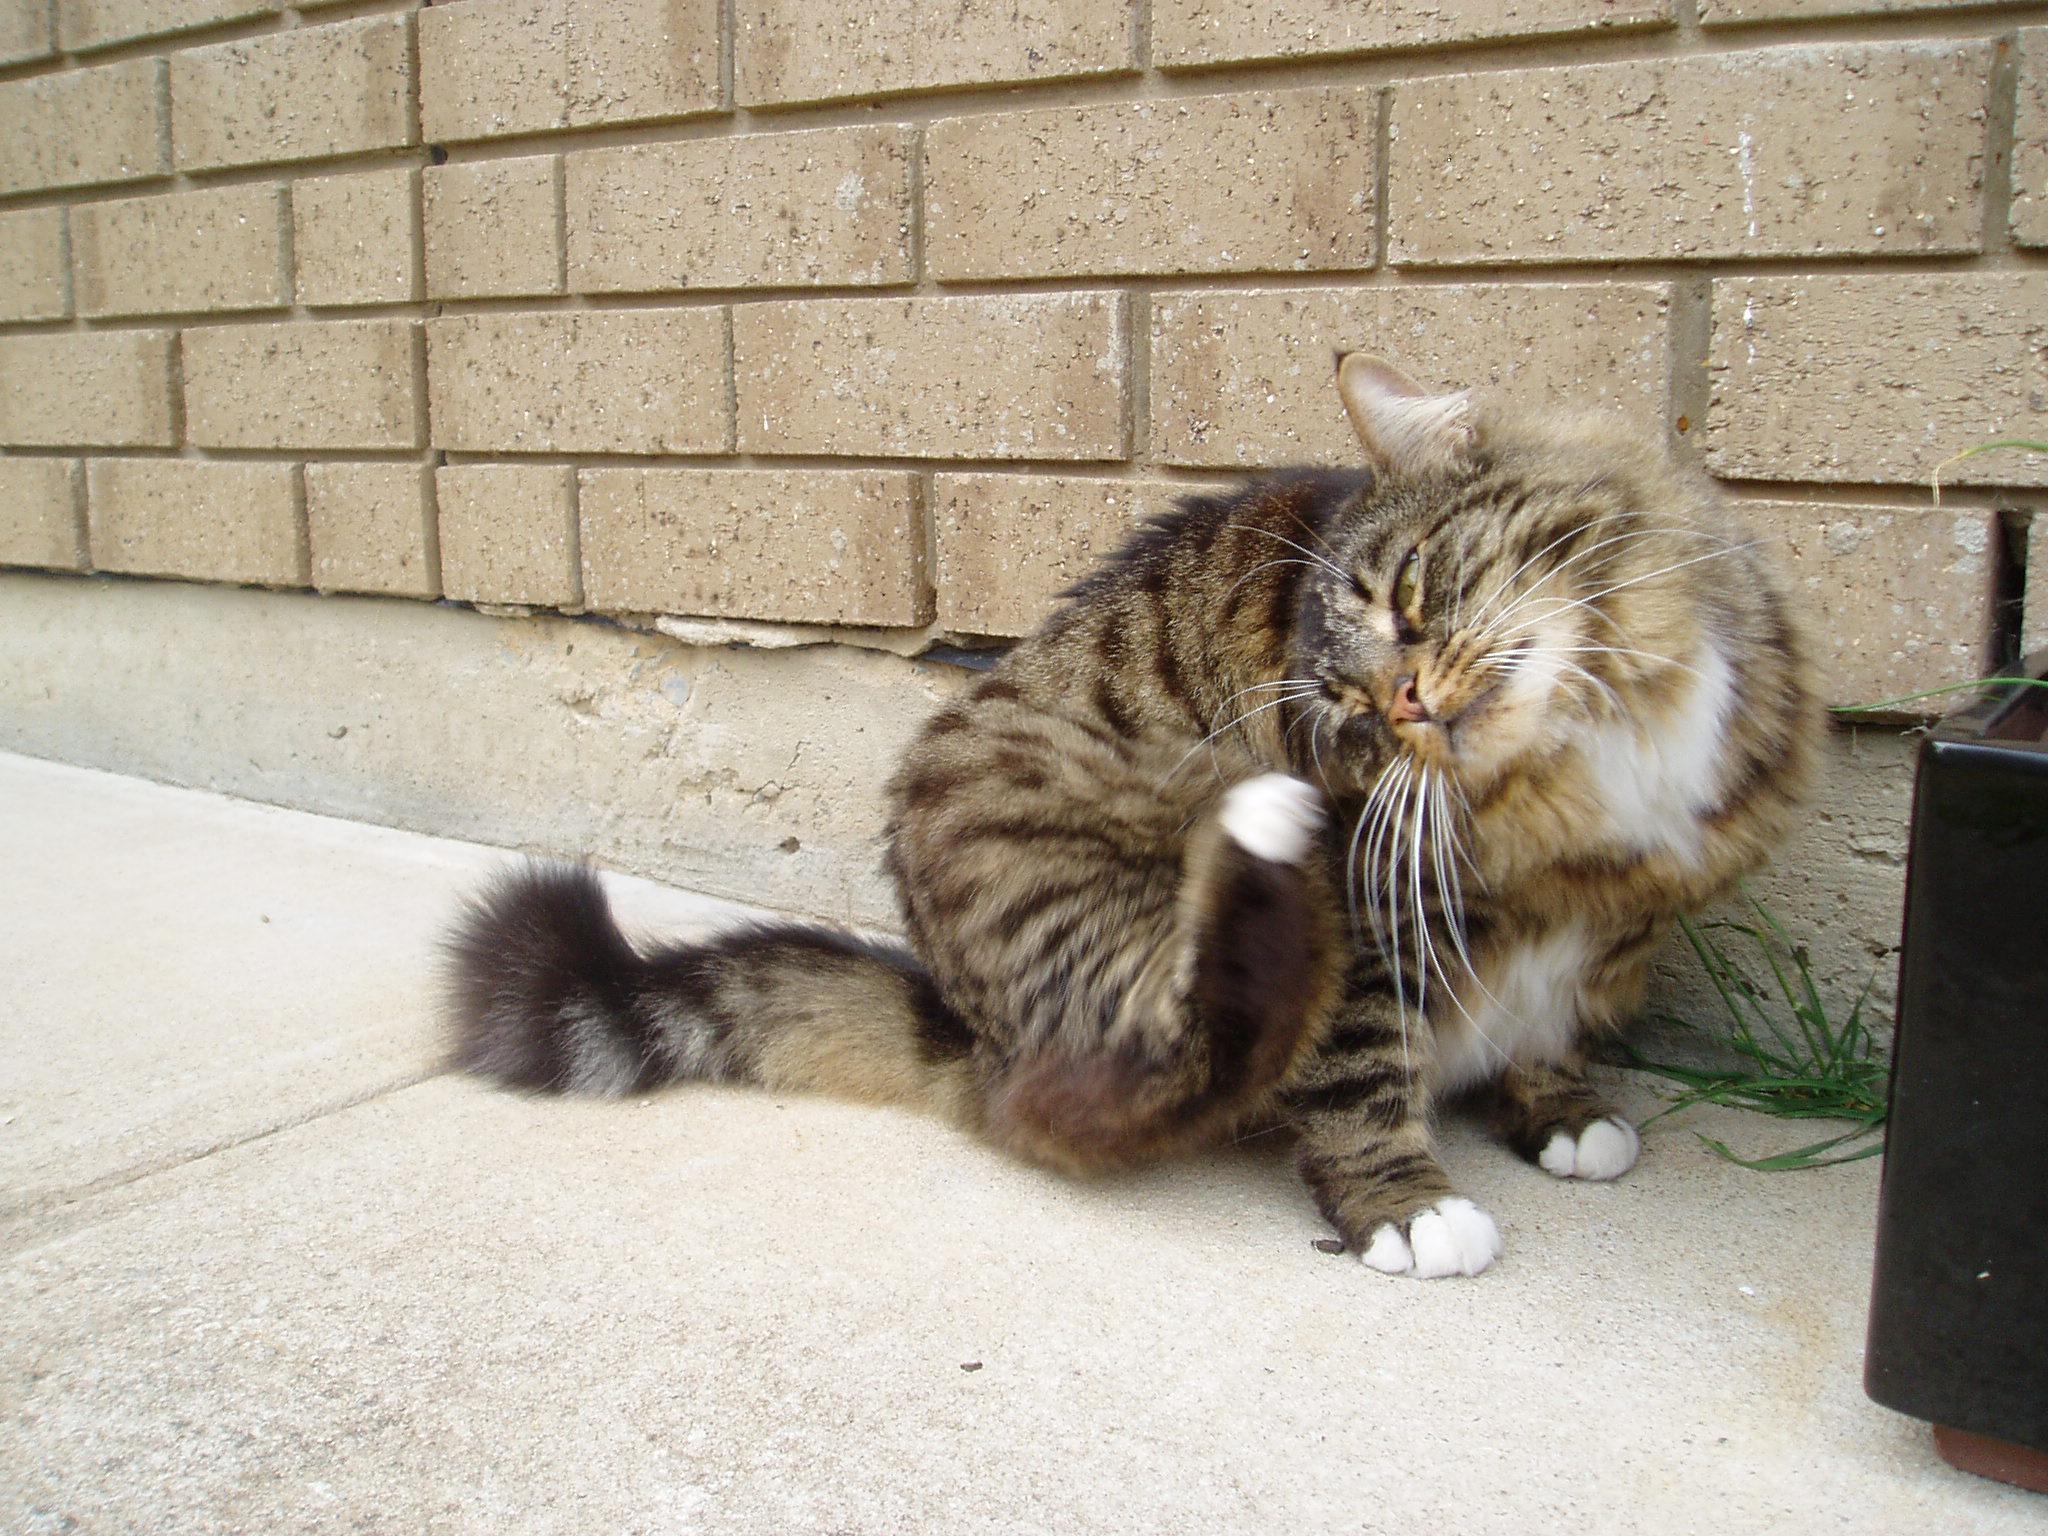 http://upload.wikimedia.org/wikipedia/commons/f/f6/Munchkin_cat_grooming.jpg